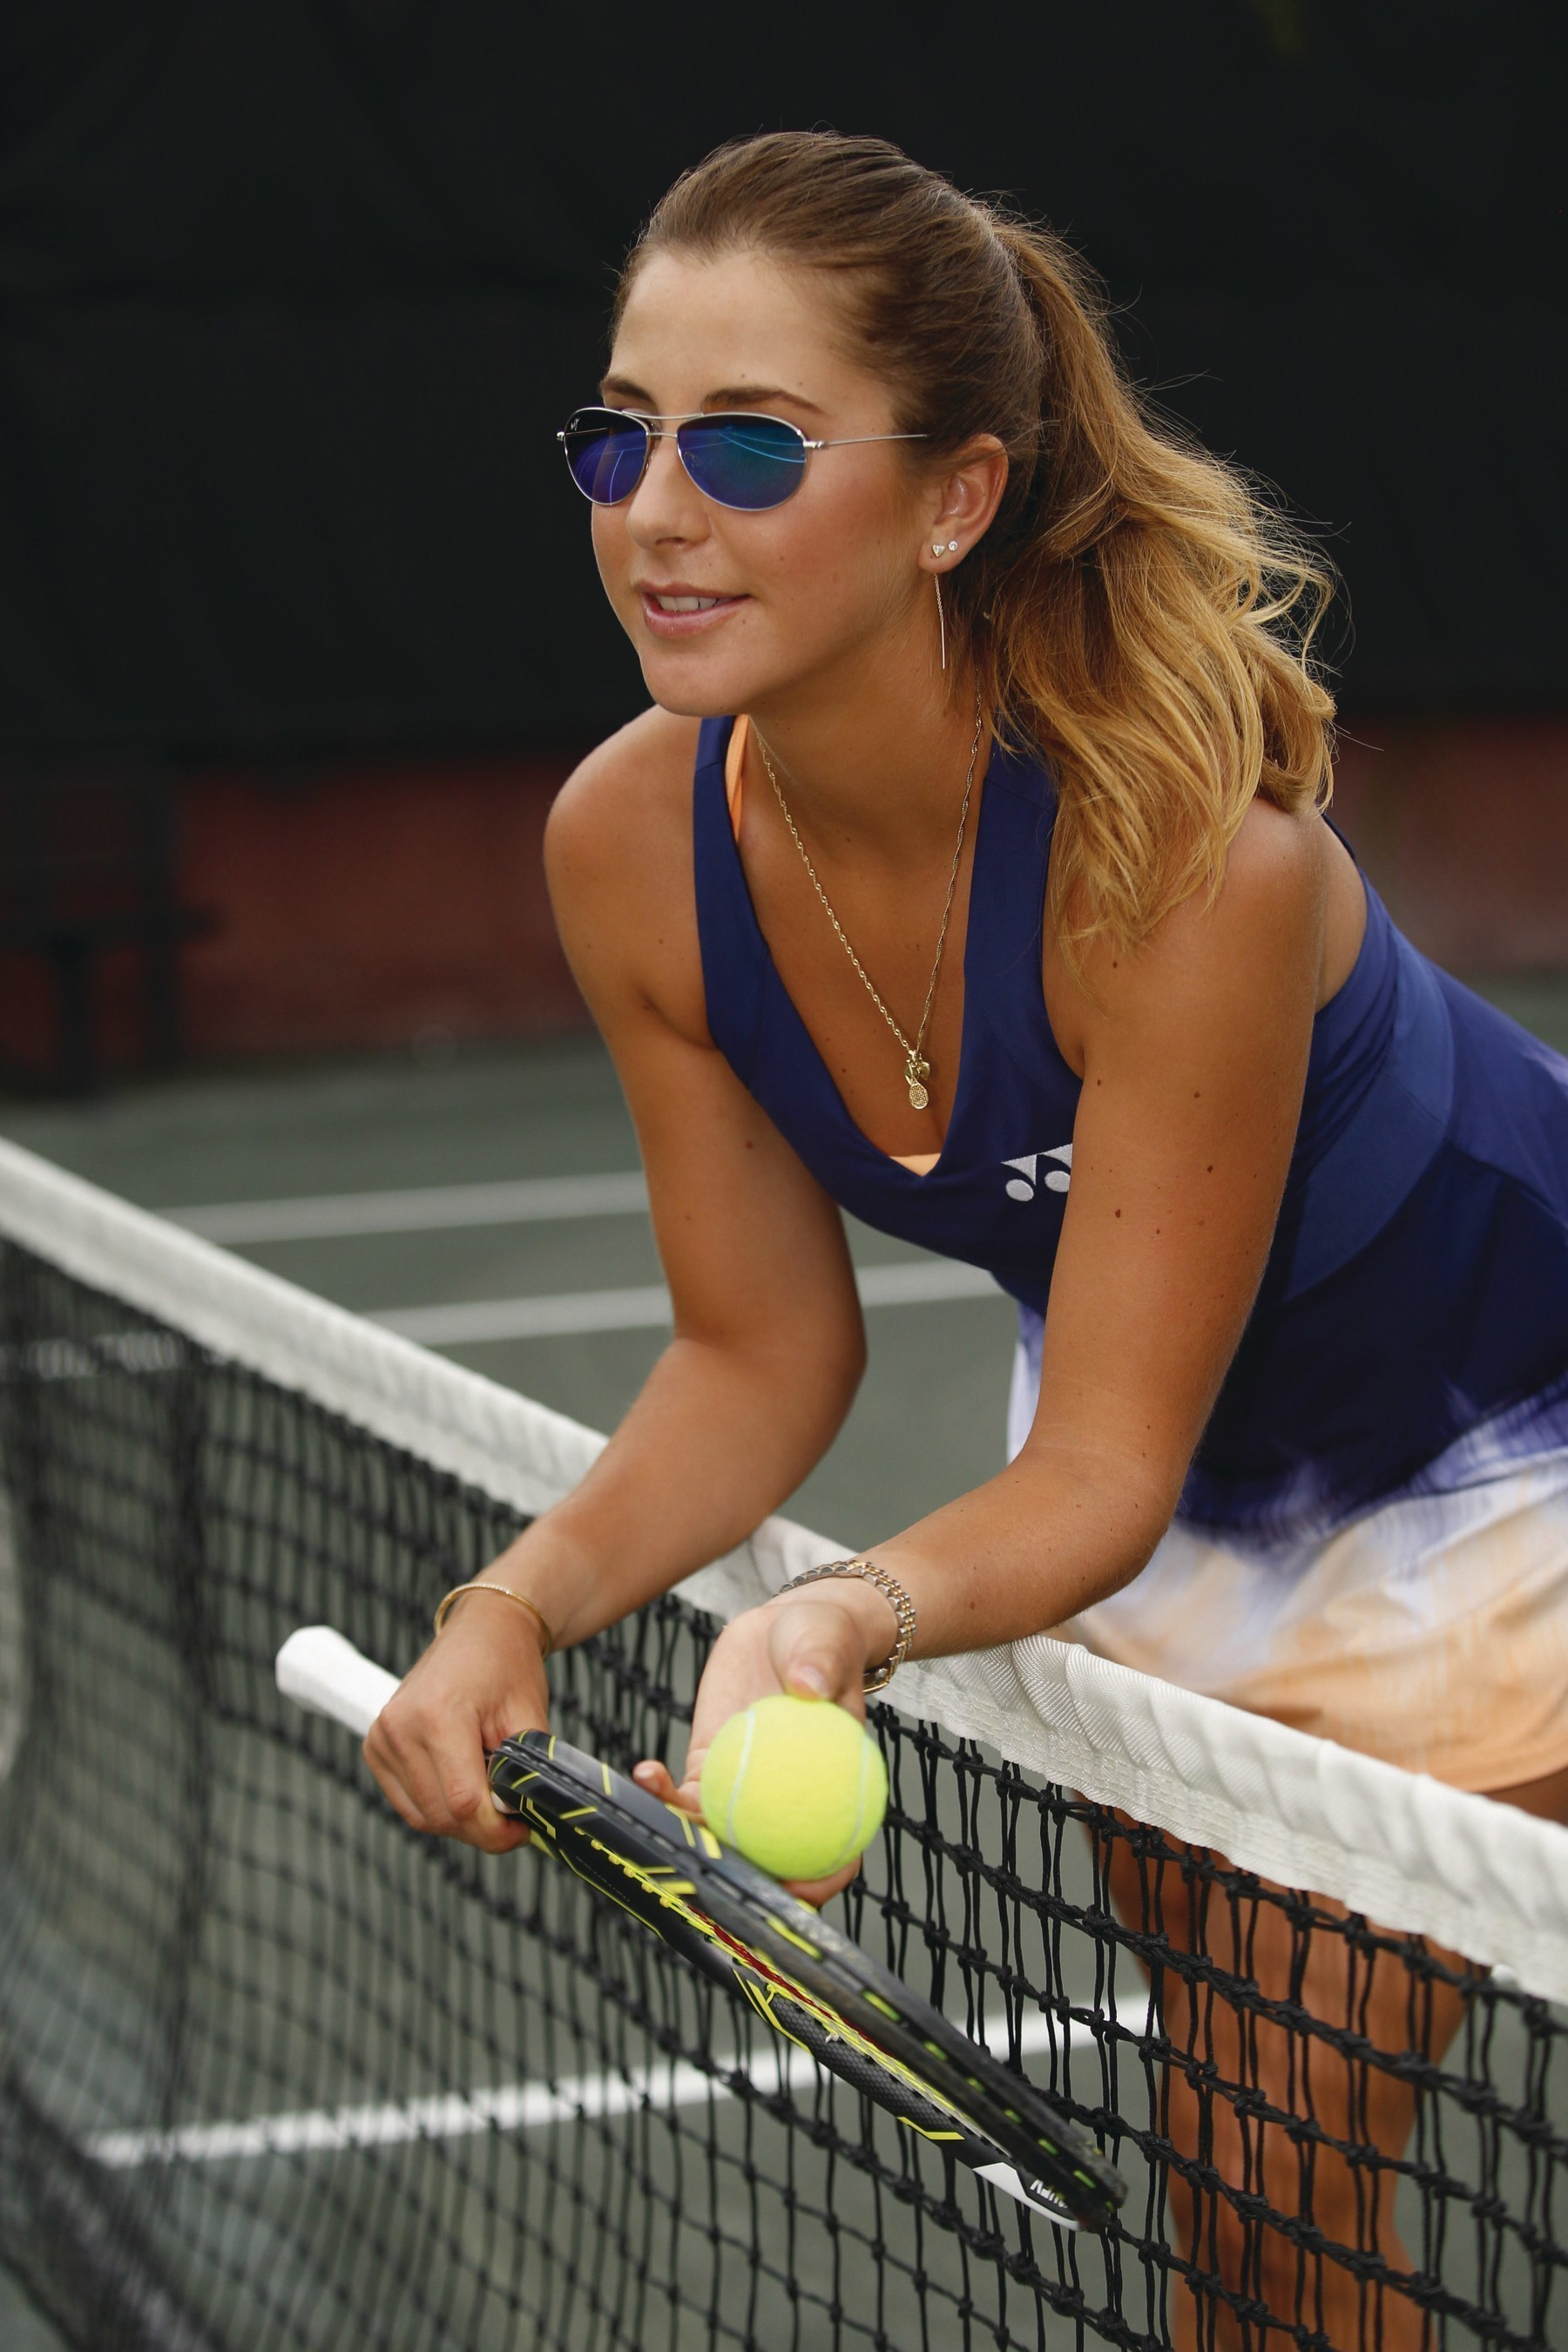 d35d0242804eb WTA Rising Star Belinda Bencic Joins Maui Jim s Team Of Ambassadors